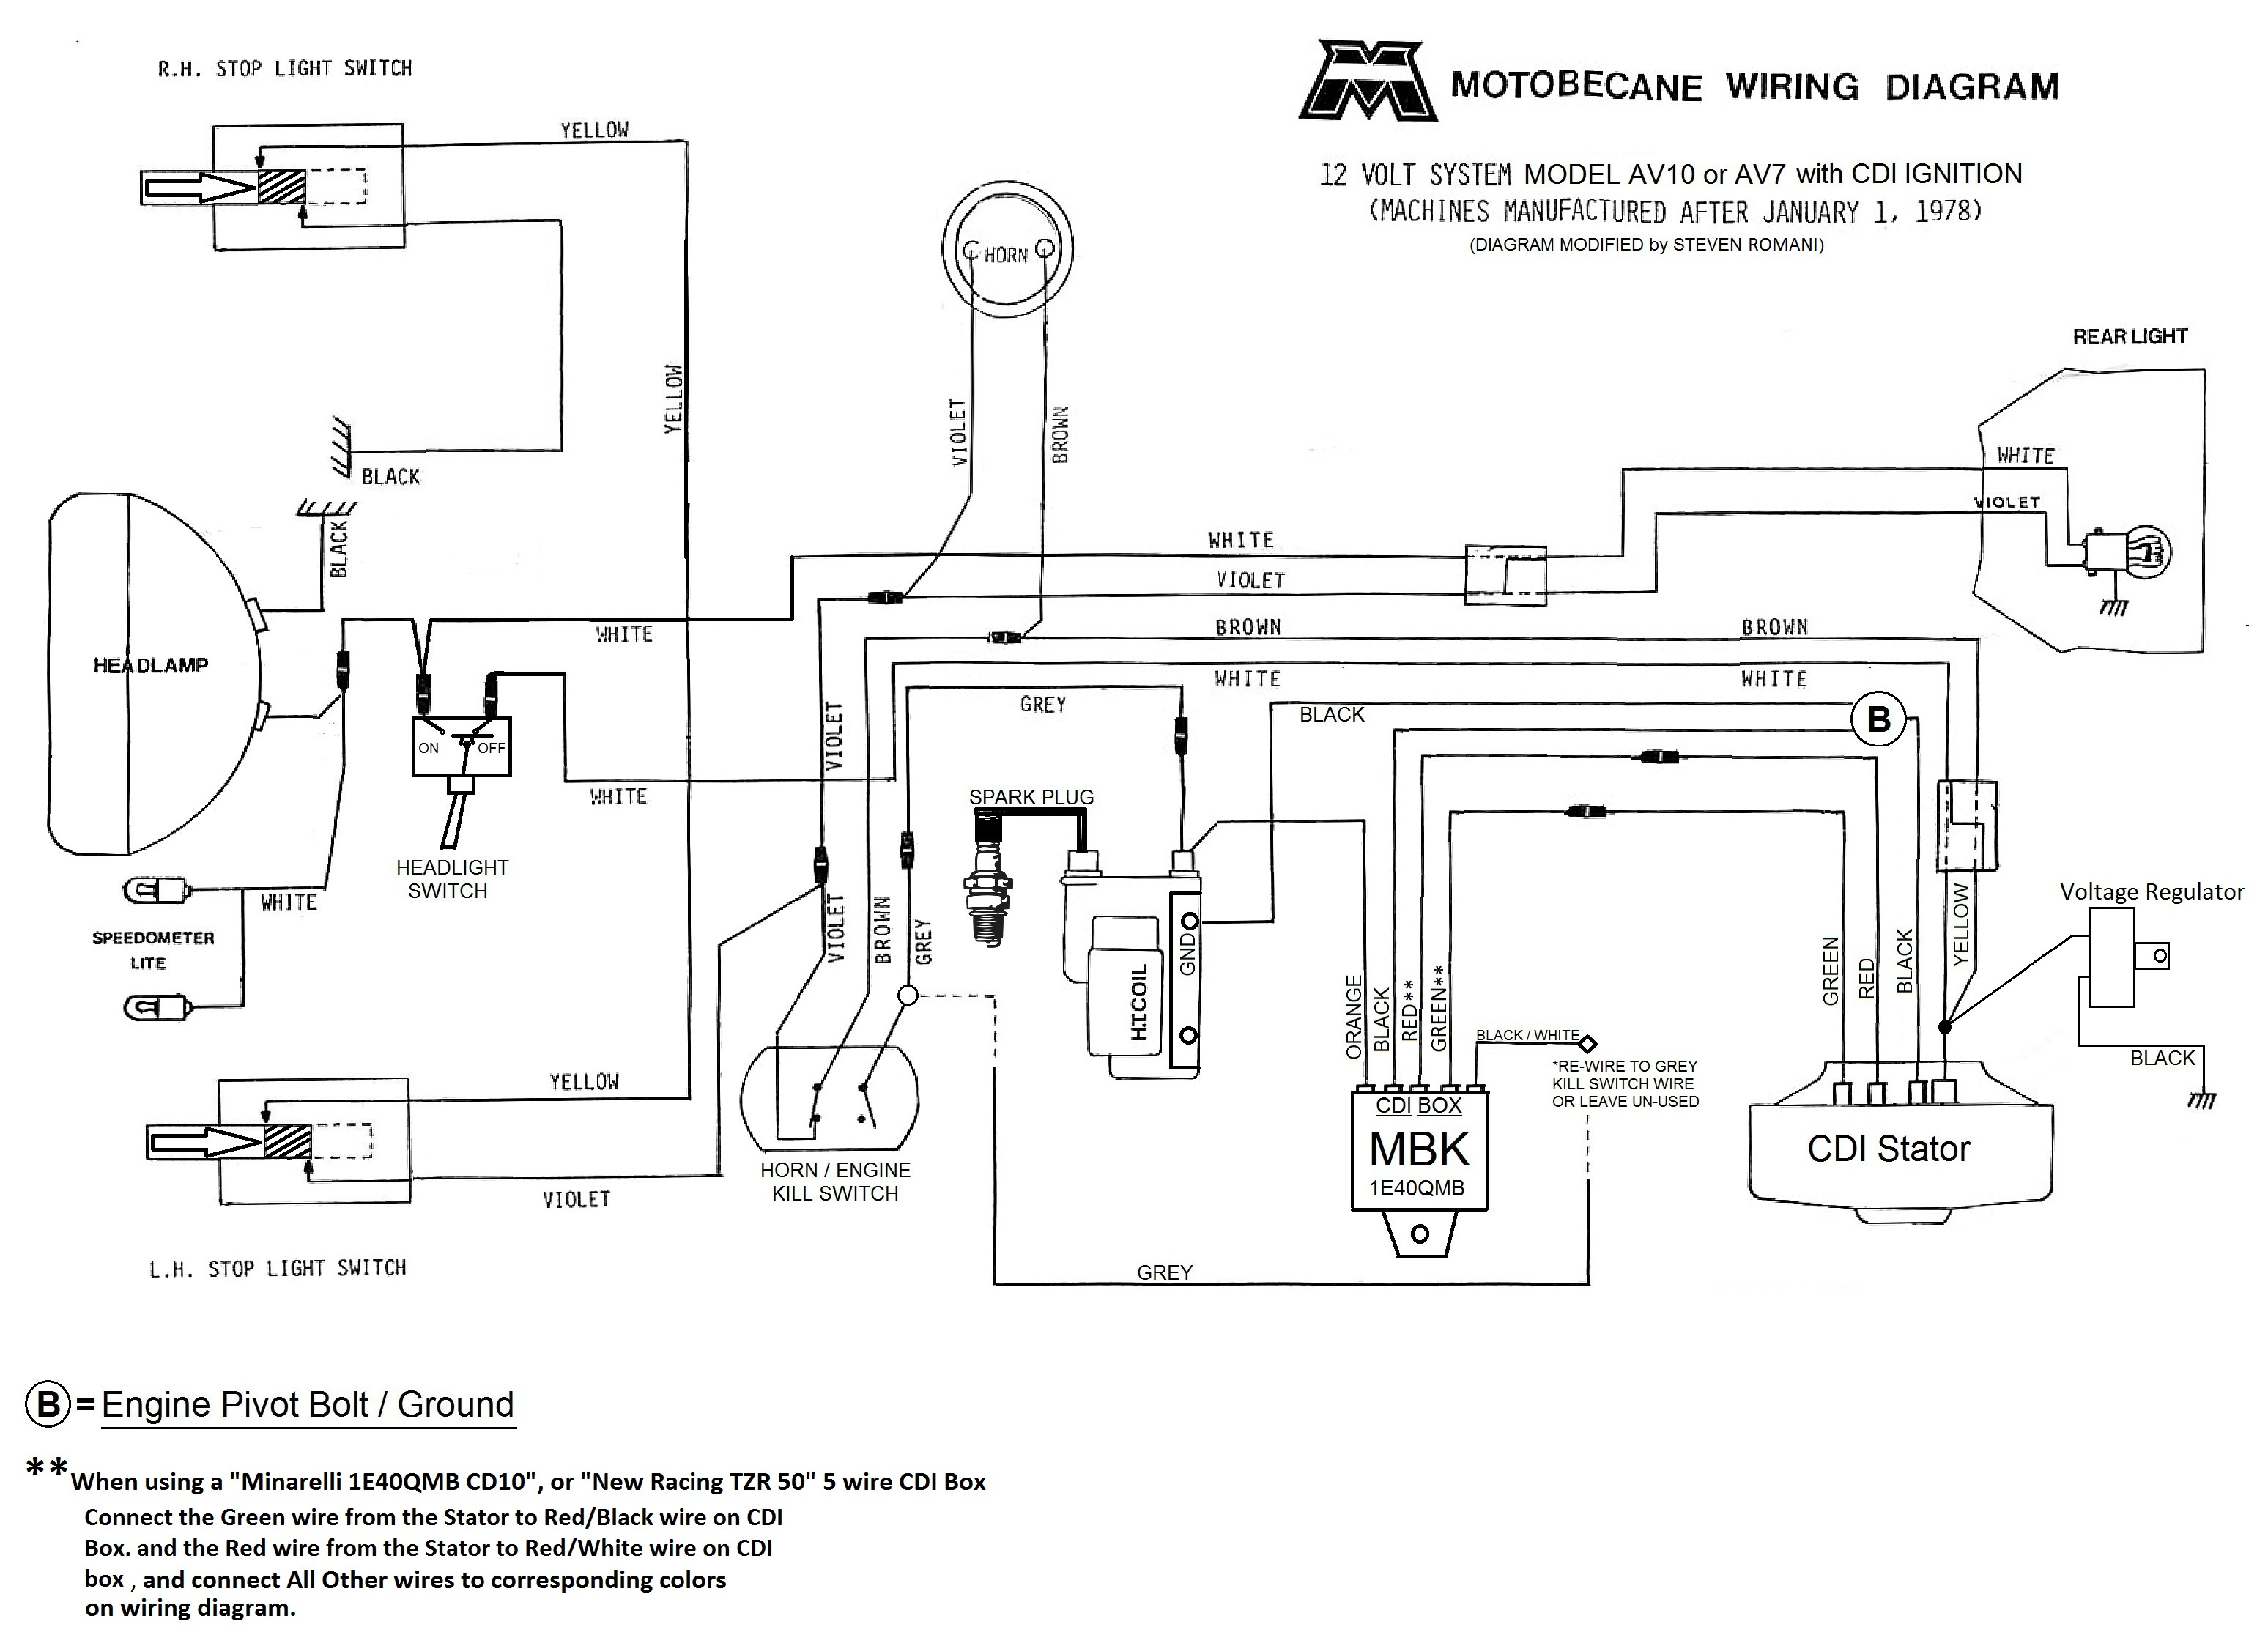 Pleasing Imagemotobecane12V Wiring Diagram Basic Electronics Wiring Diagram Wiring 101 Kniepimsautoservicenl